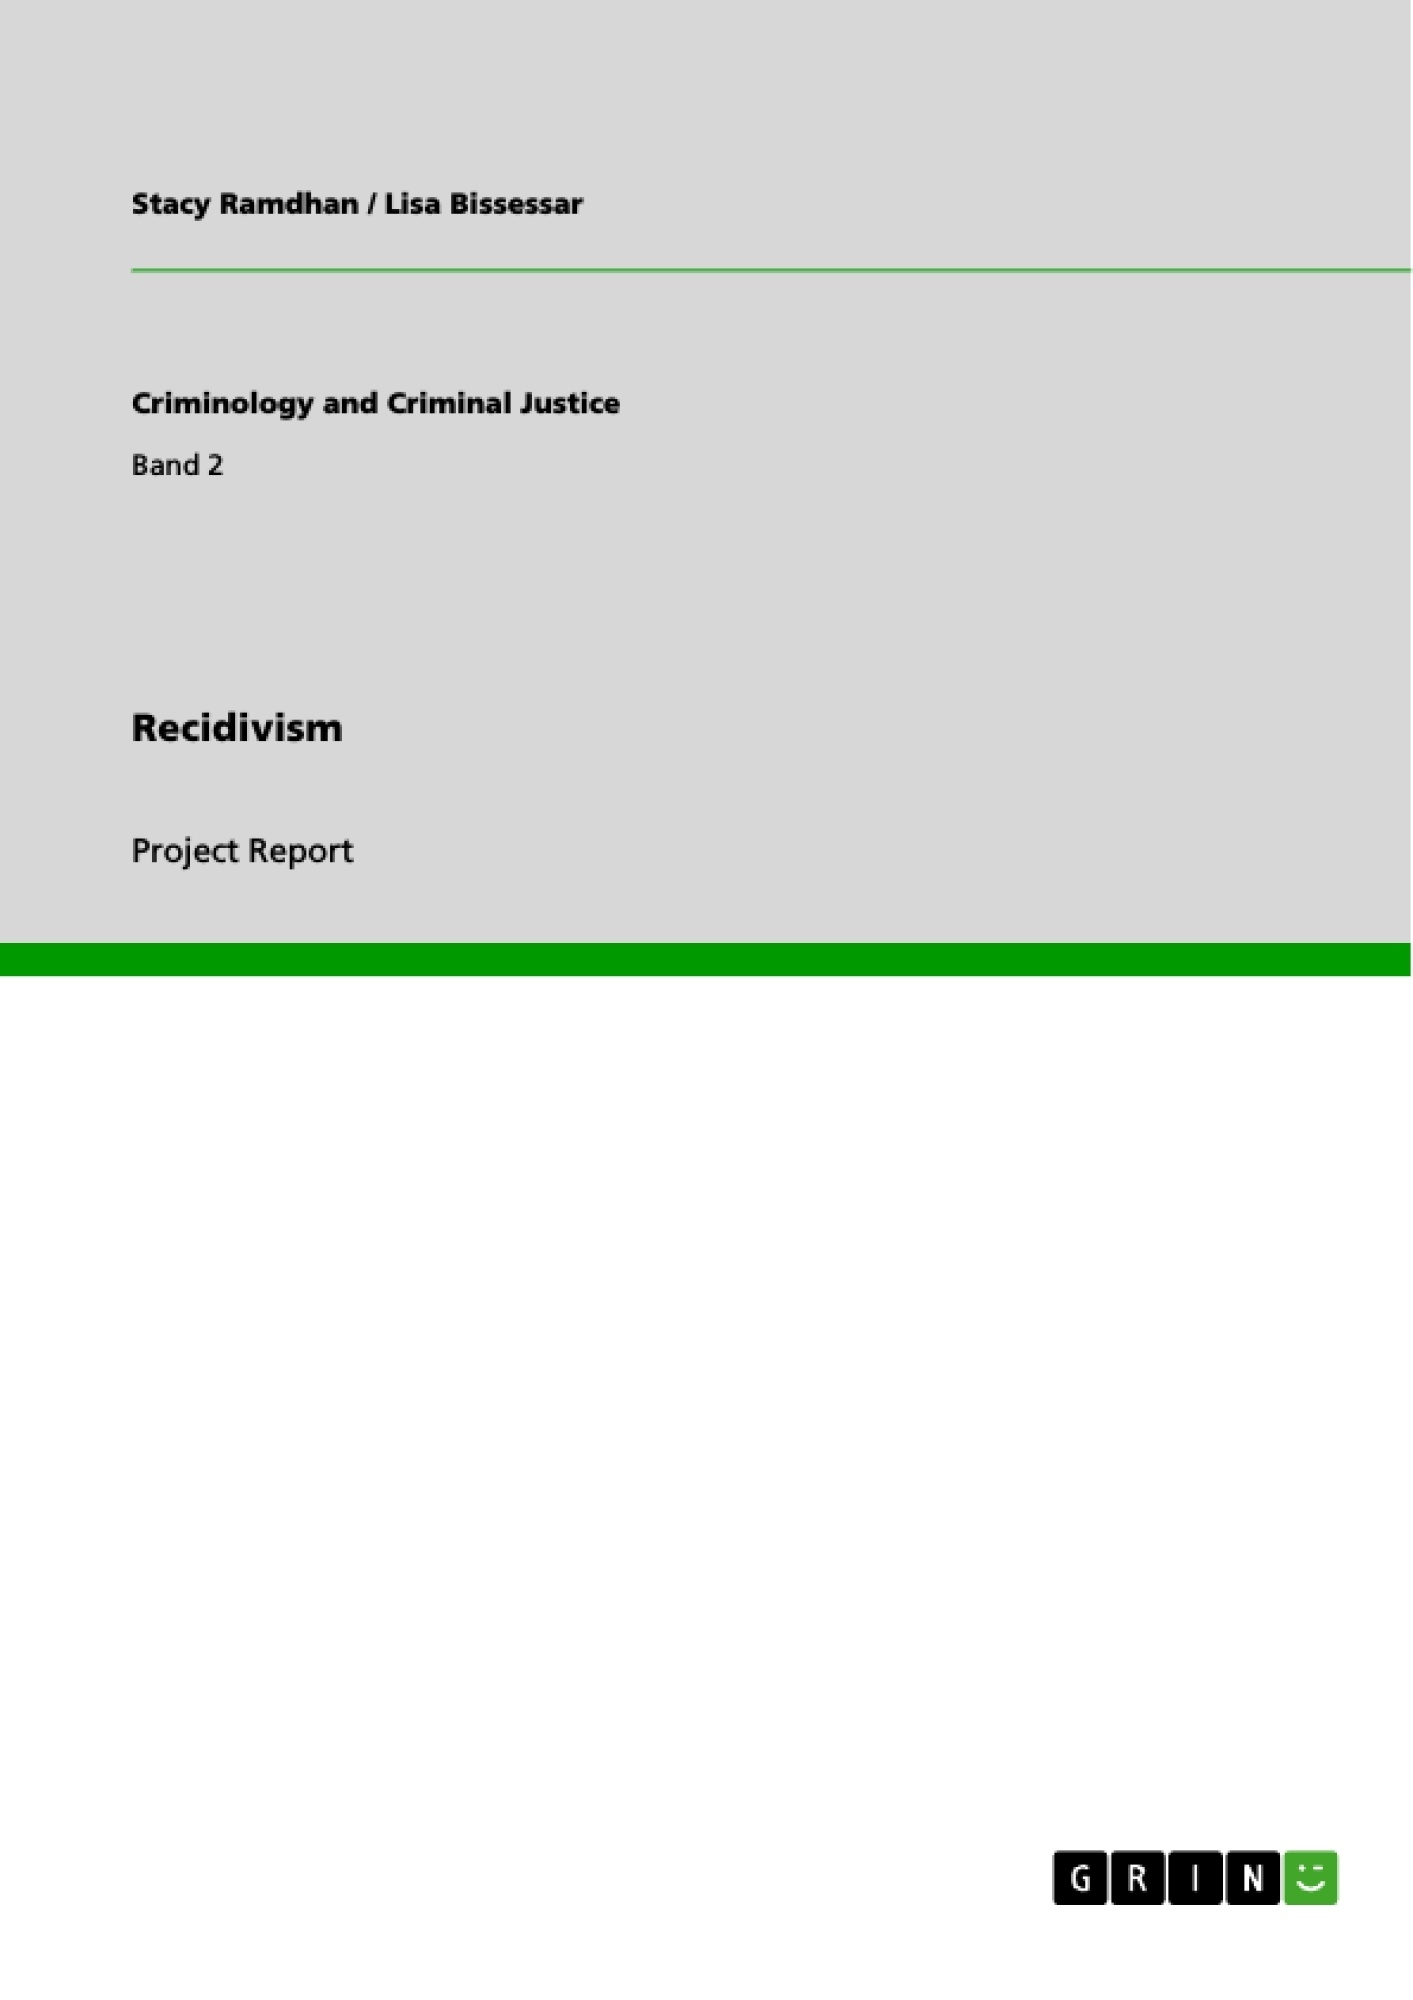 Criminal Recidivism Research Paper Starter